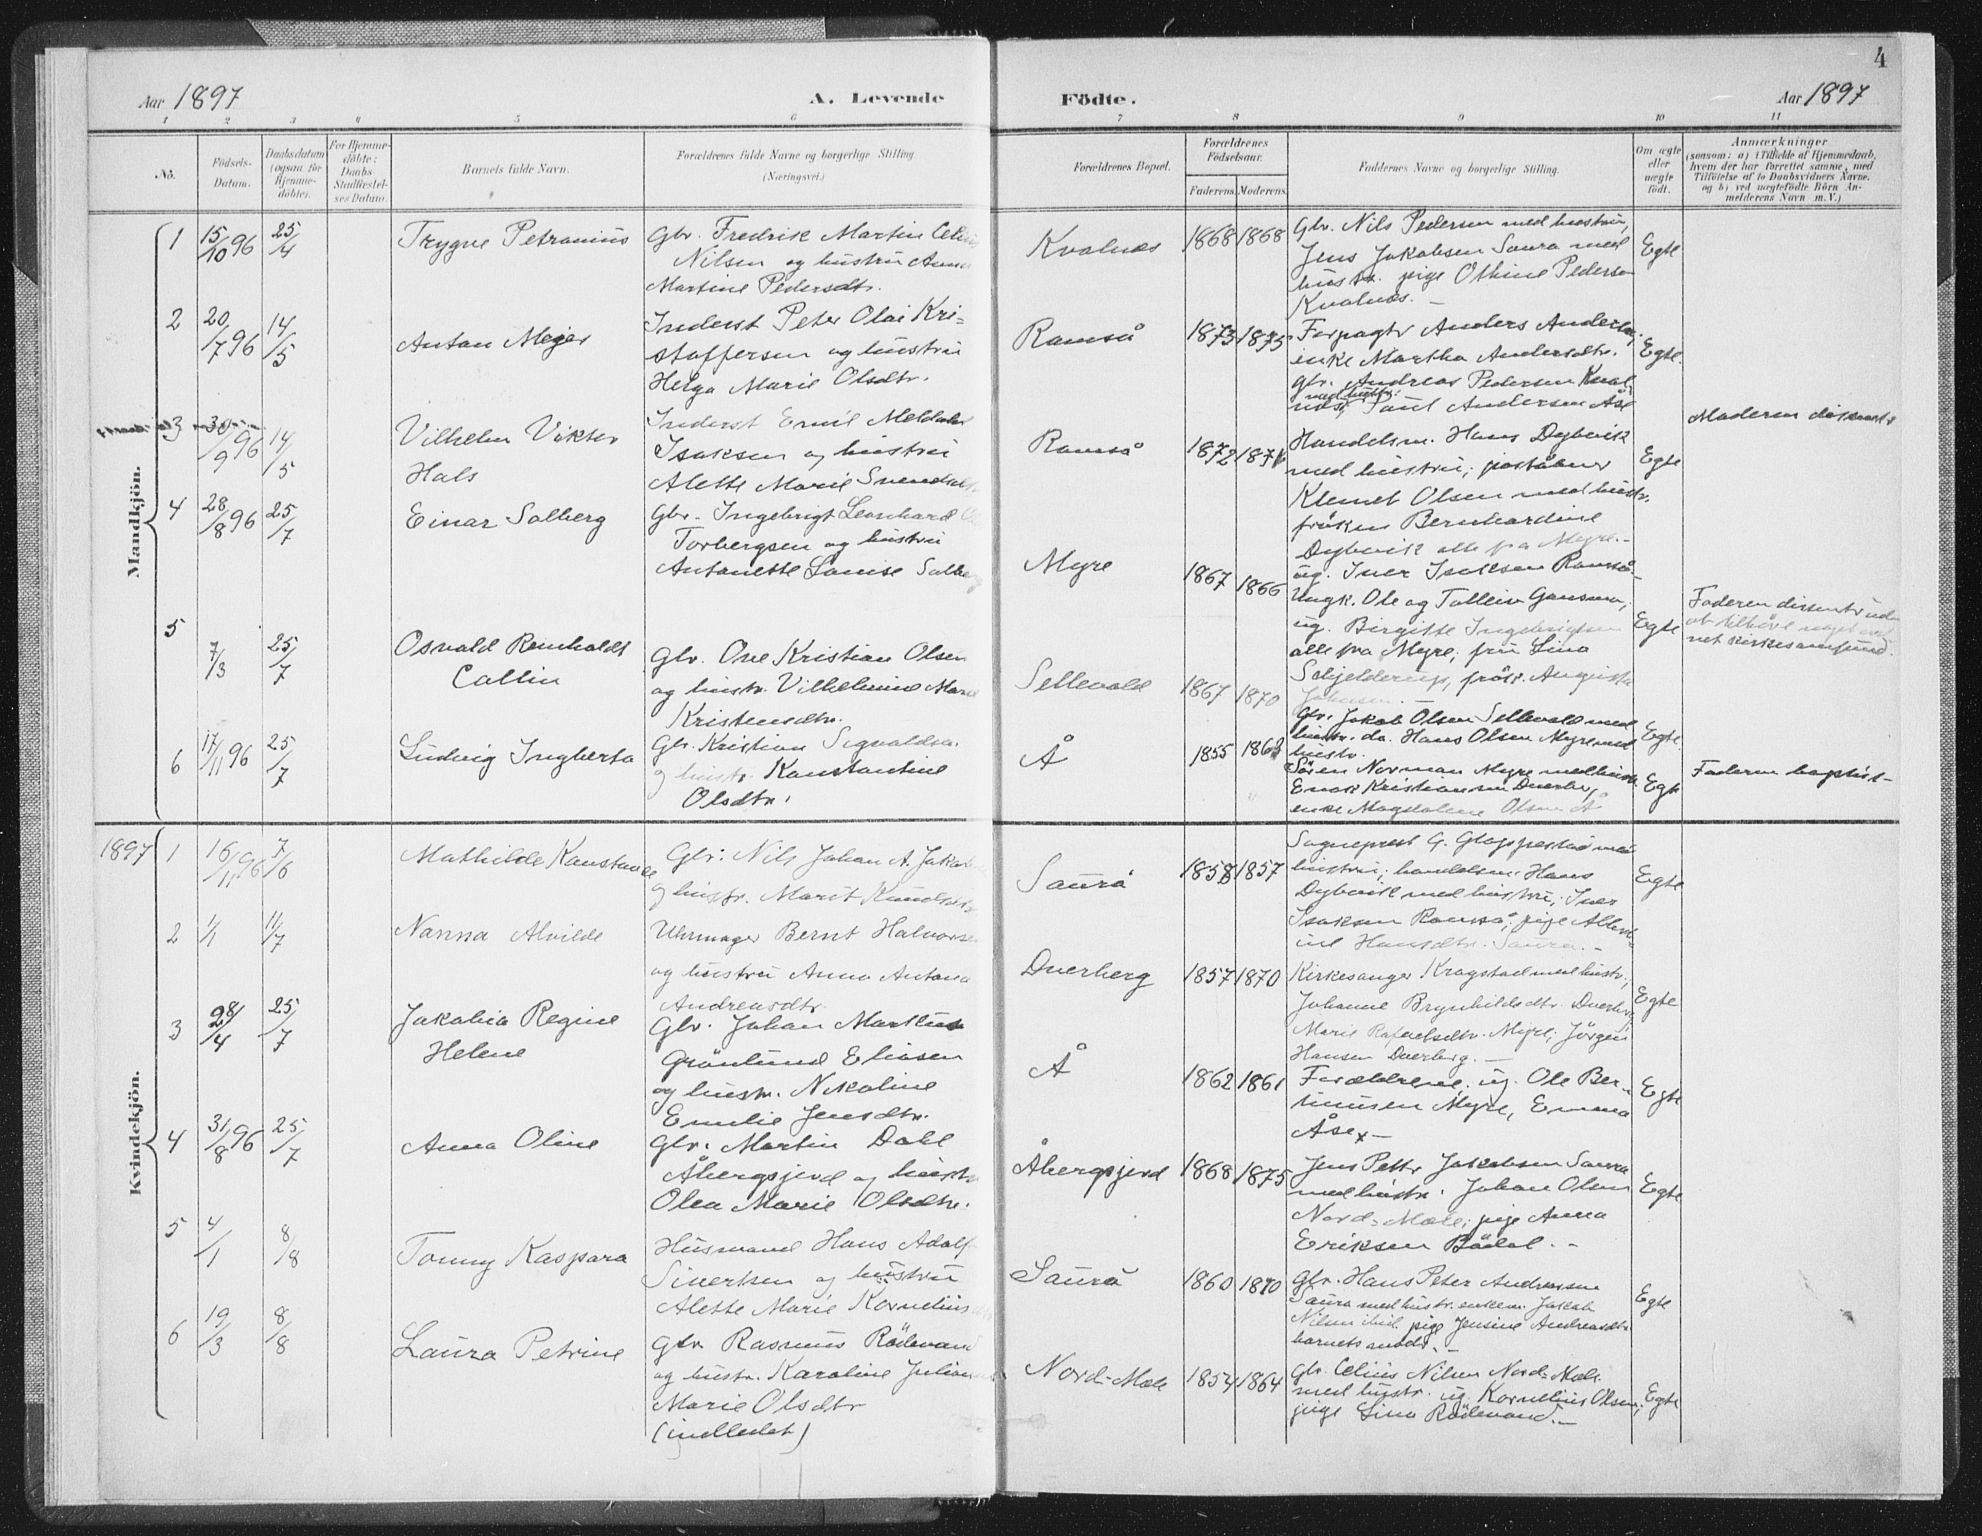 SAT, Ministerialprotokoller, klokkerbøker og fødselsregistre - Nordland, 897/L1400: Ministerialbok nr. 897A07, 1897-1908, s. 4